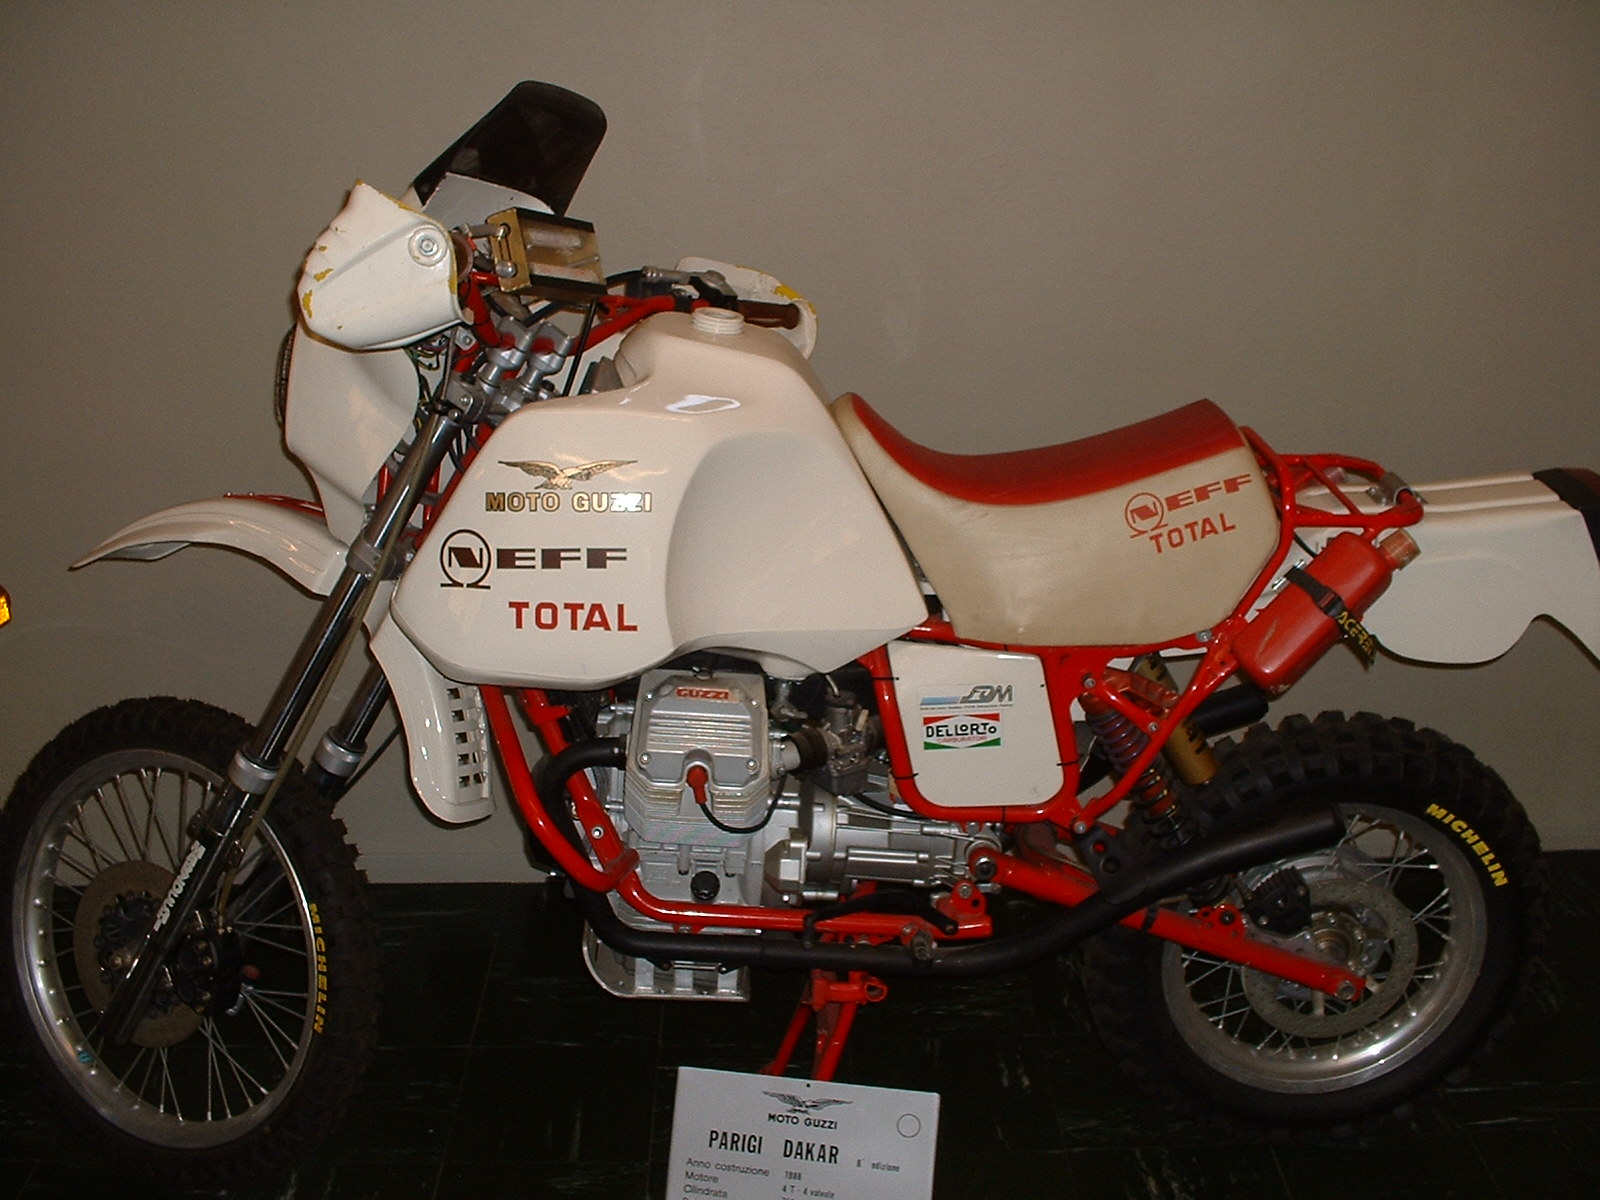 Moto Guzzi Paris Dakar 750 4-Valve Racer